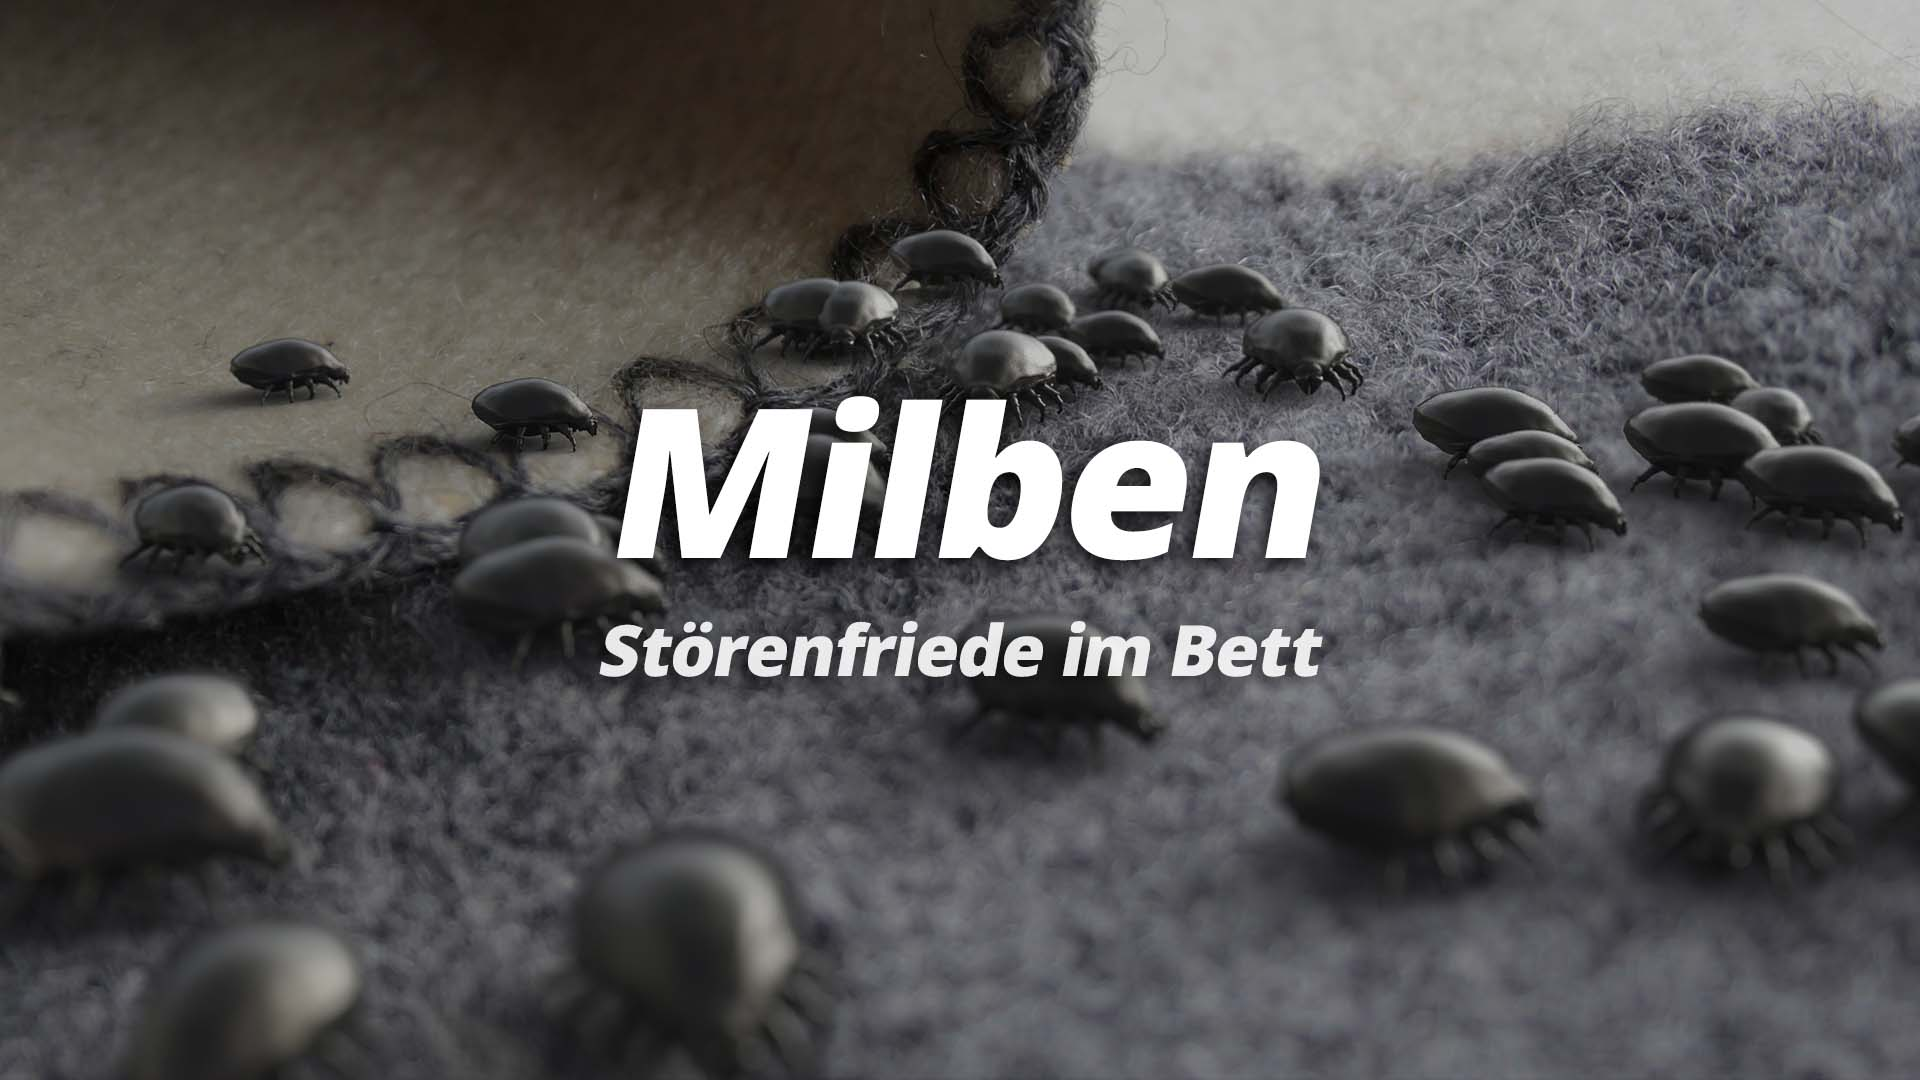 milben-stoerenfriede-im-bett